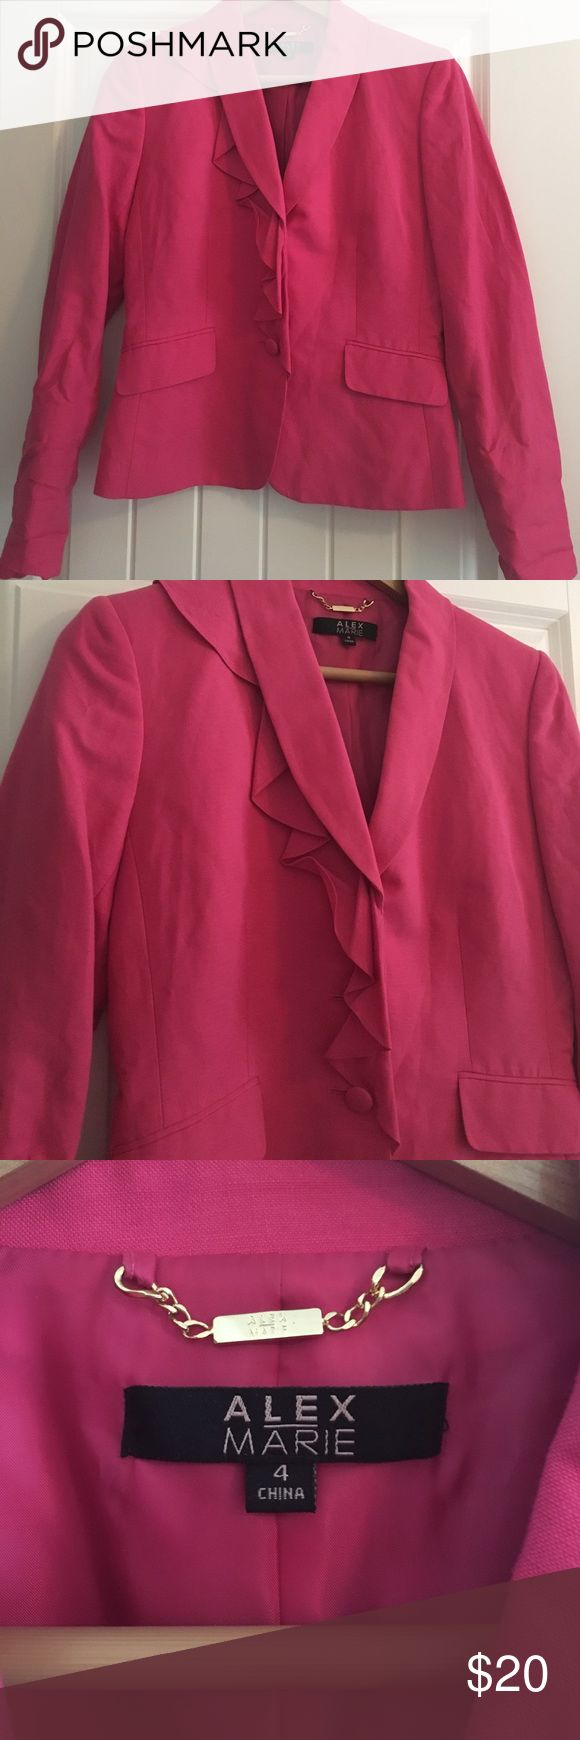 Alex Marie Hot Pink Ruffle Blazer Alex Marie Hot Pink Ruffle Blazer - NWOT - size 4 Alex Marie Jackets & Coats Blazers